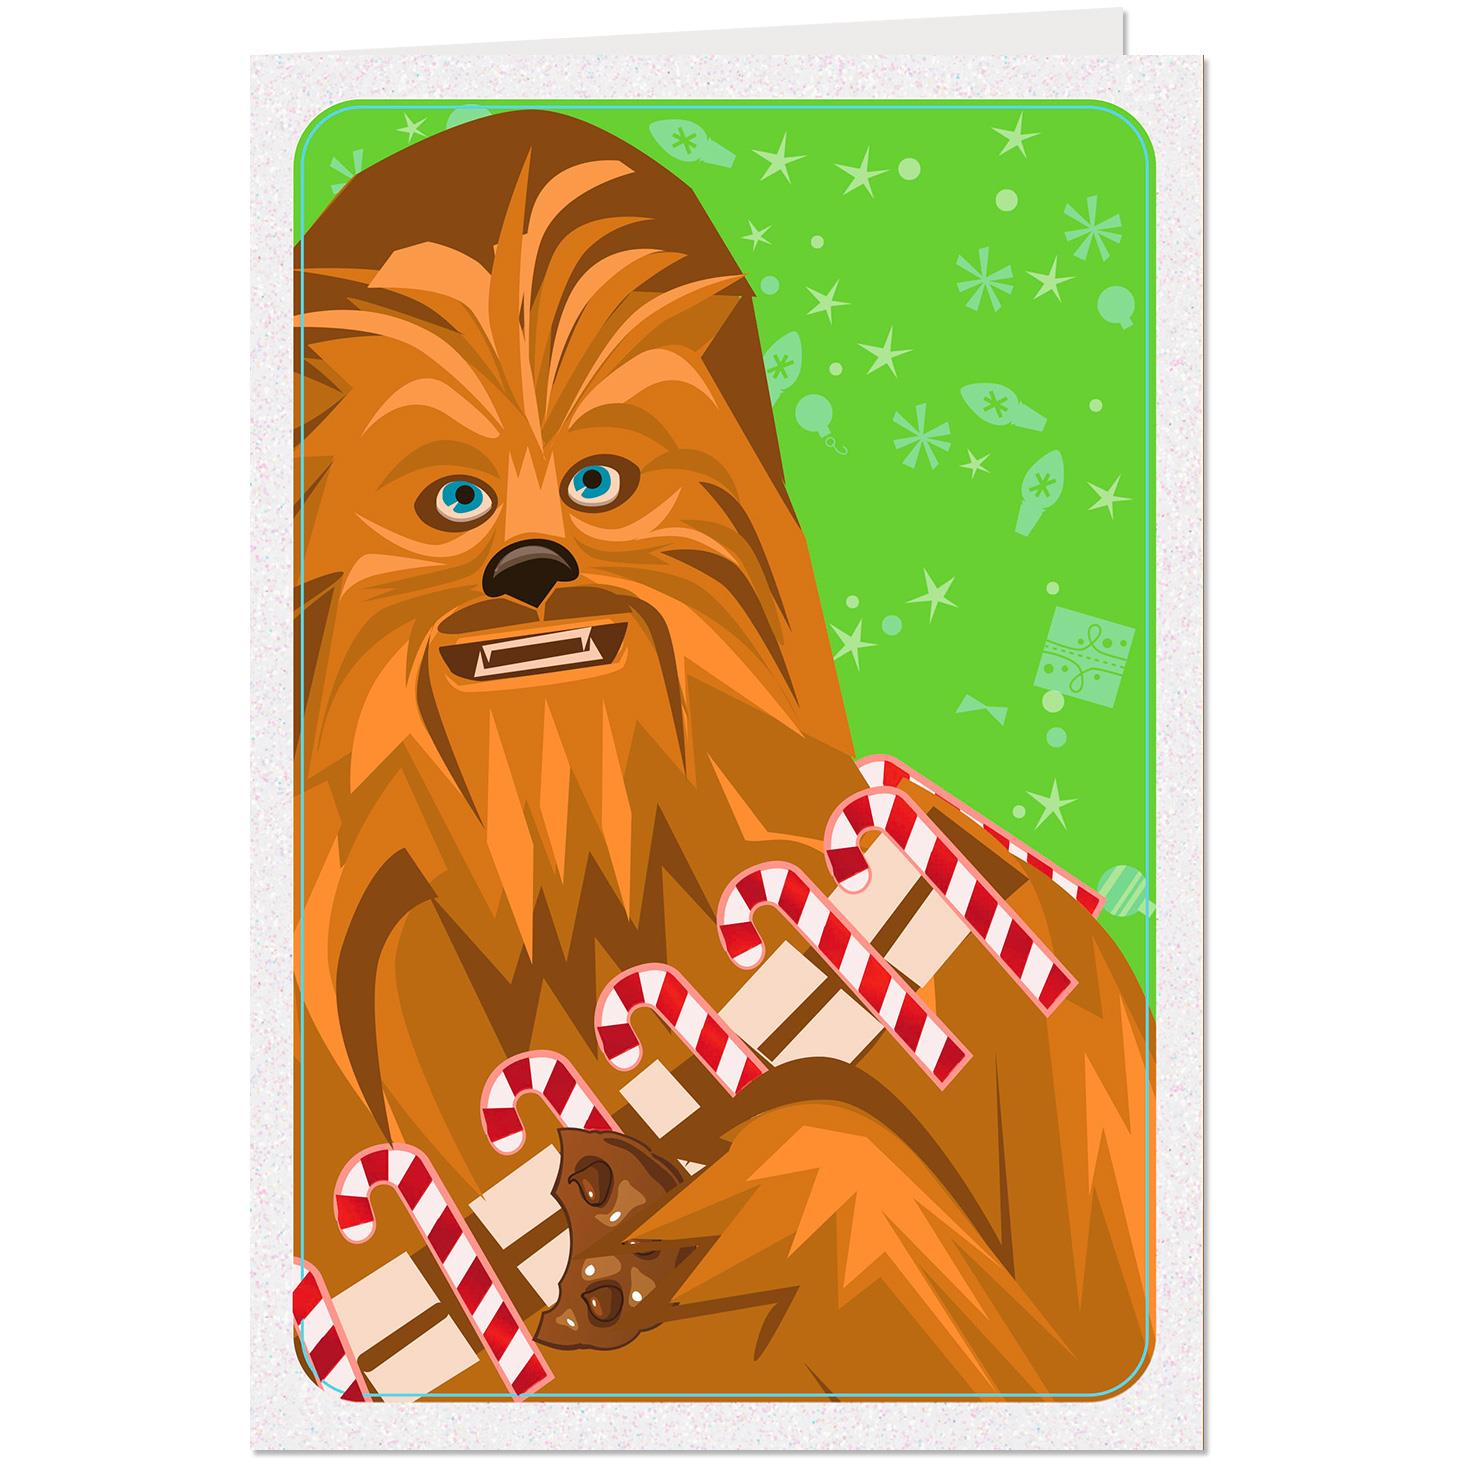 star wars chewbacca wookiee little christmas card